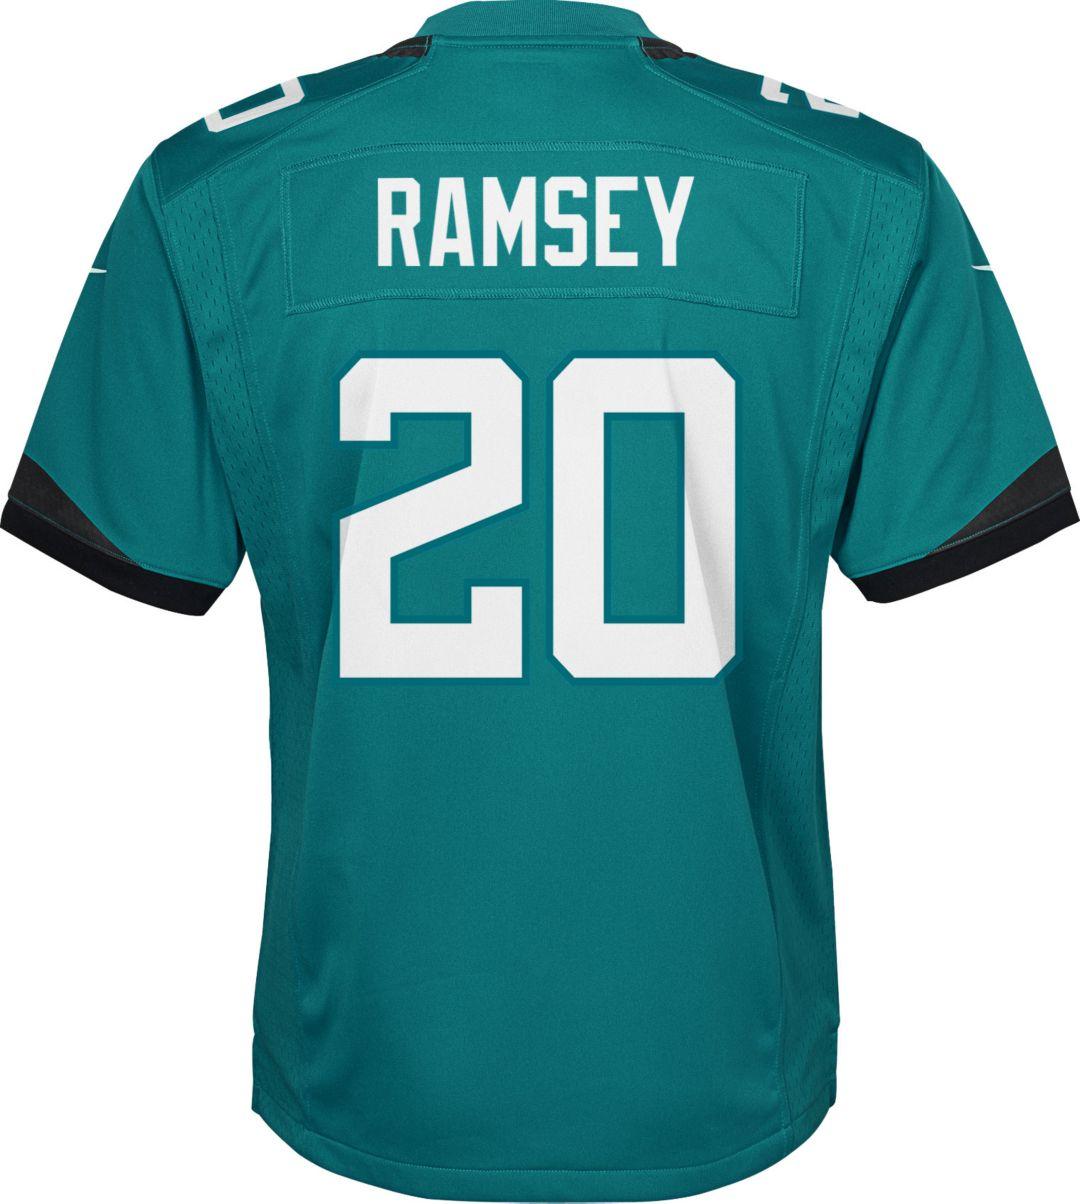 quality design 91547 02dfa Nike Youth Alternate Game Jersey Jacksonville Jaguars Jalen Ramsey #20